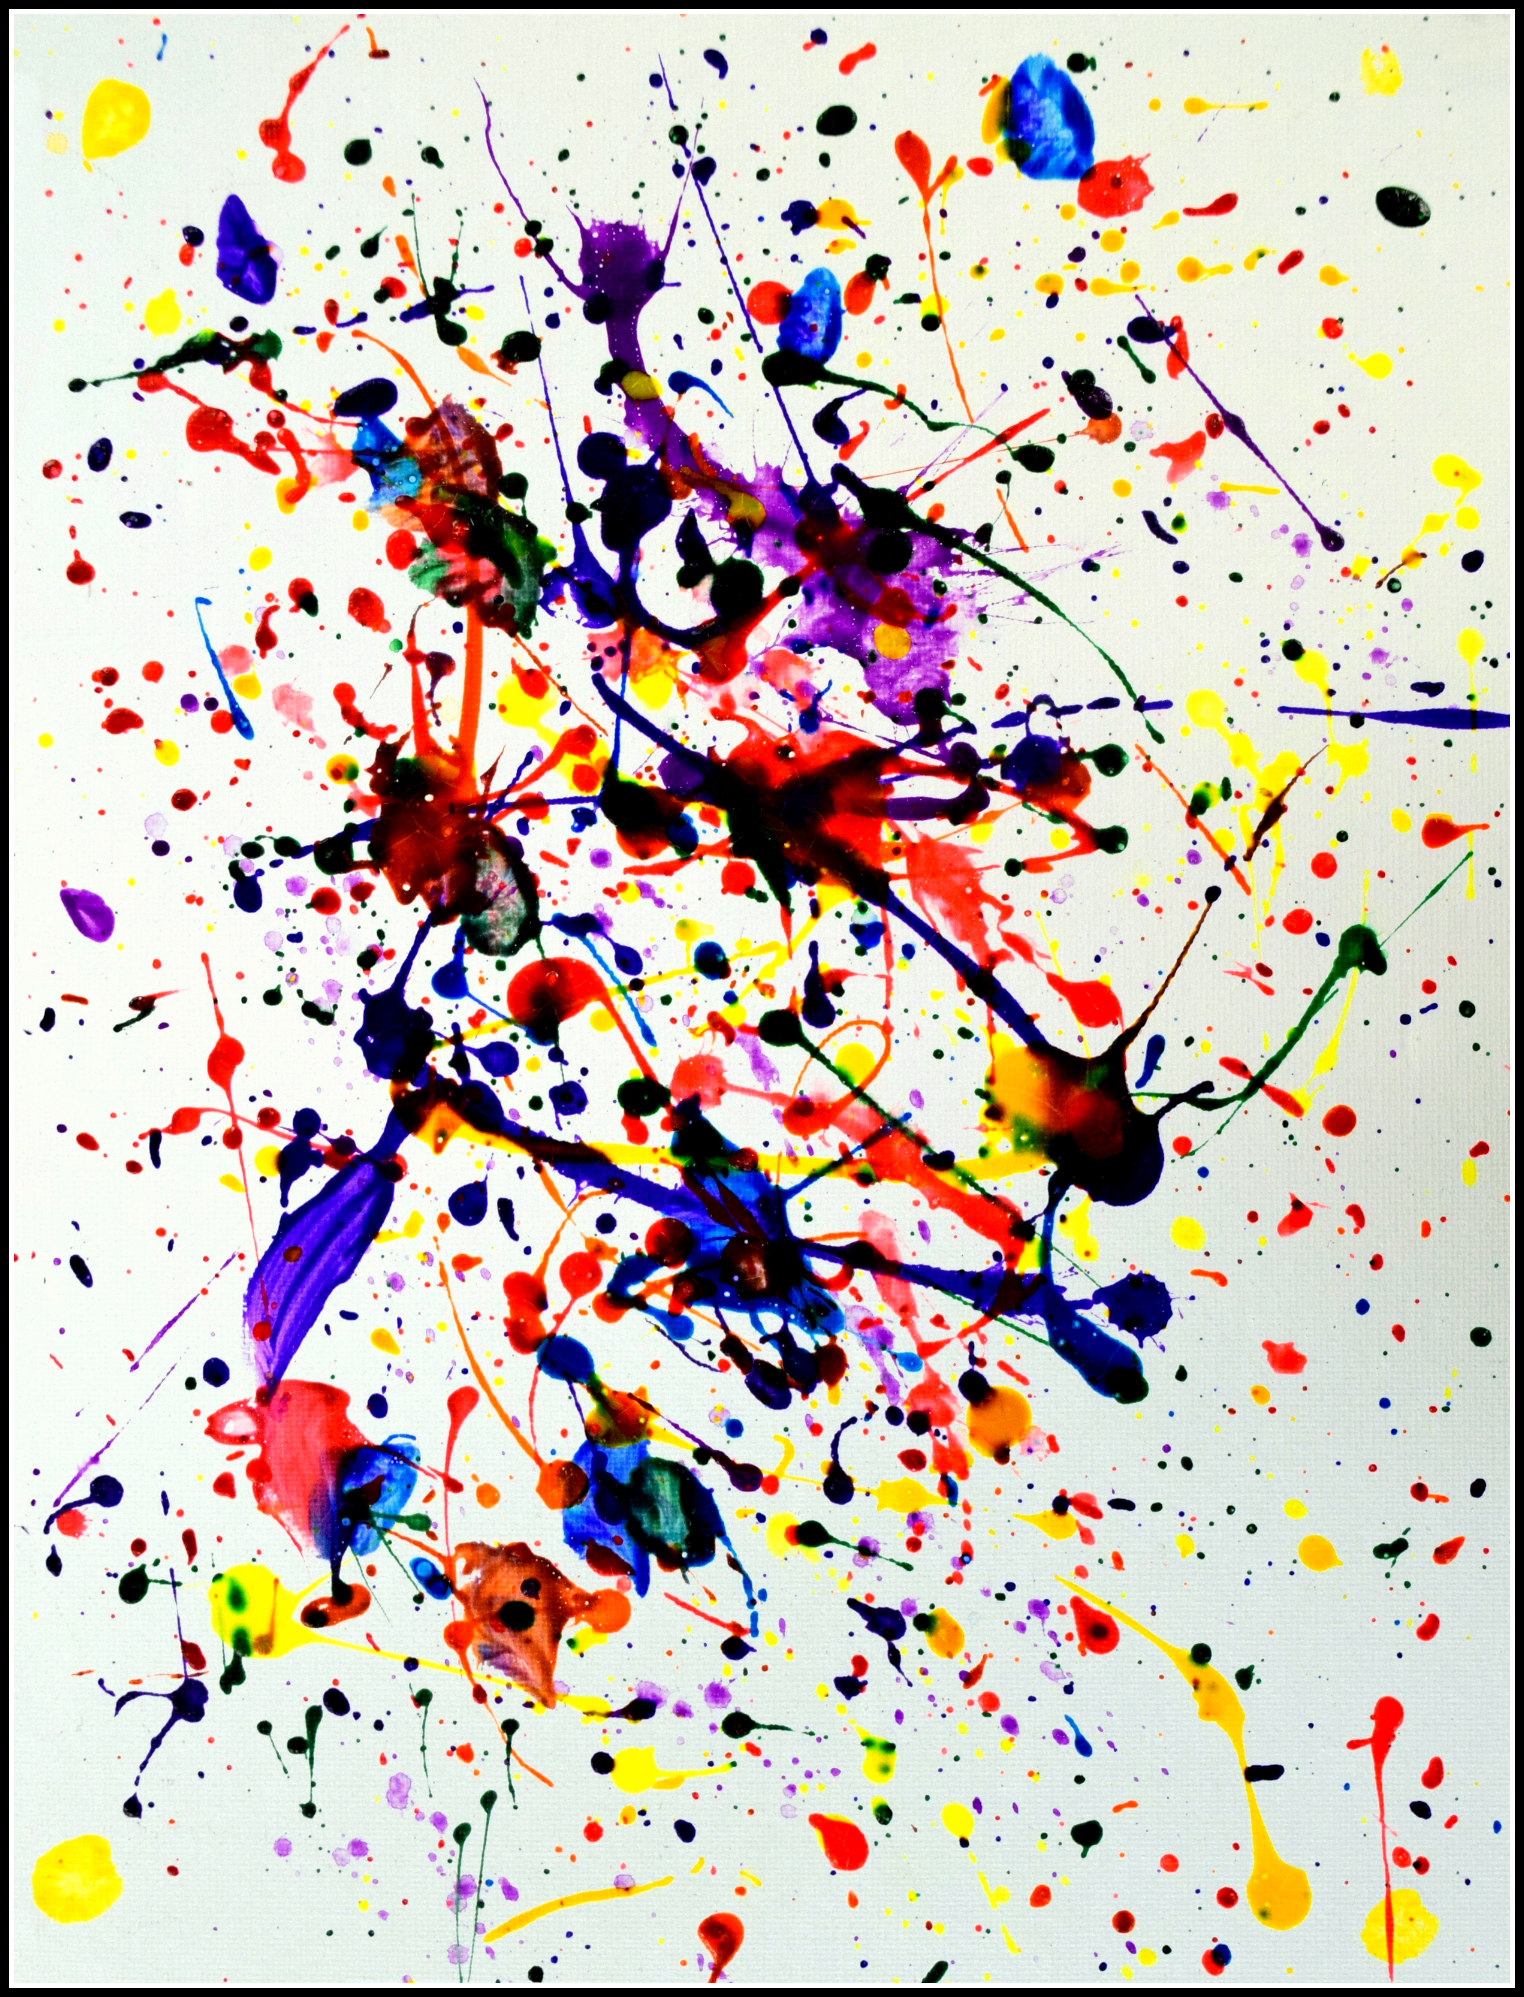 Splash Paint Jenna Helms Acrylic on paper 11x17 $15.00